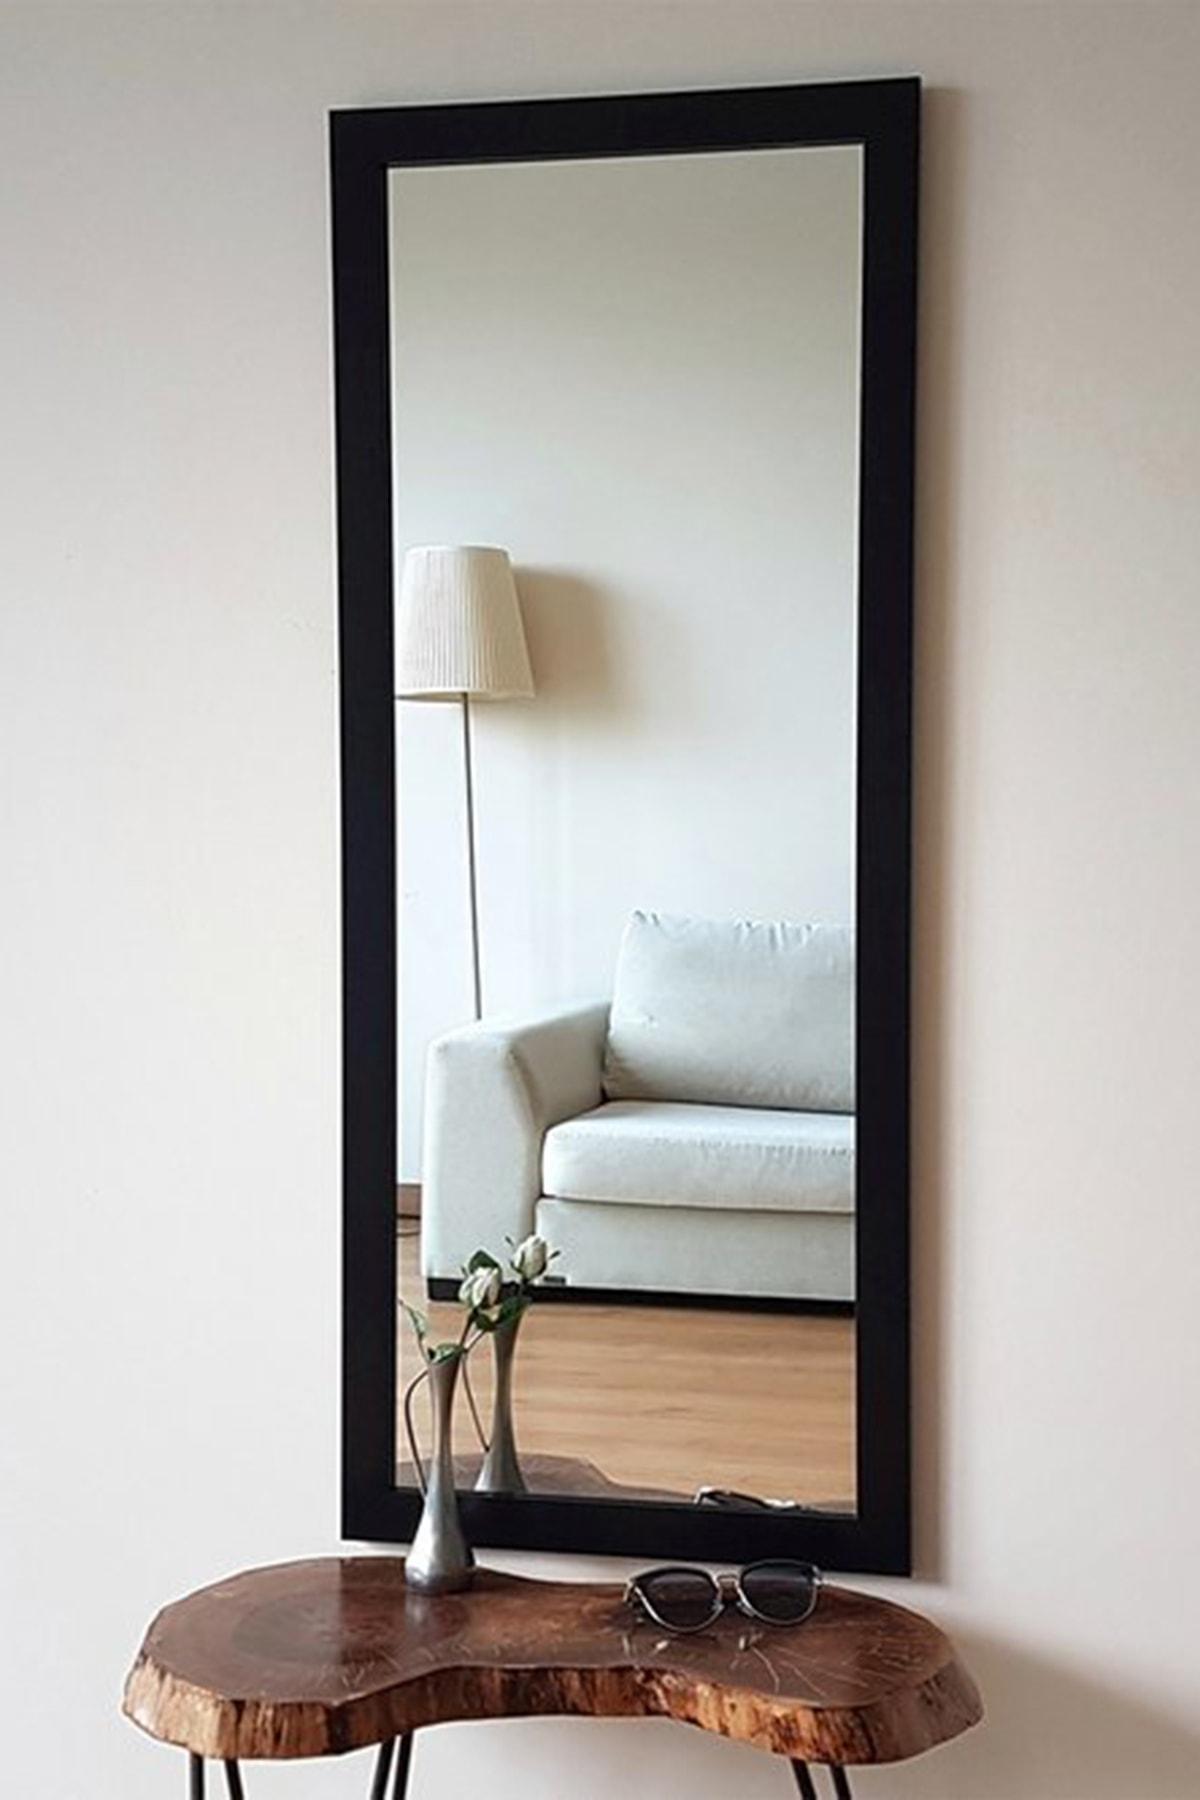 Vivense Neostill - 45X110 Cm Dekoratif Duvar Salon Ofis Boy Ayna A205 2